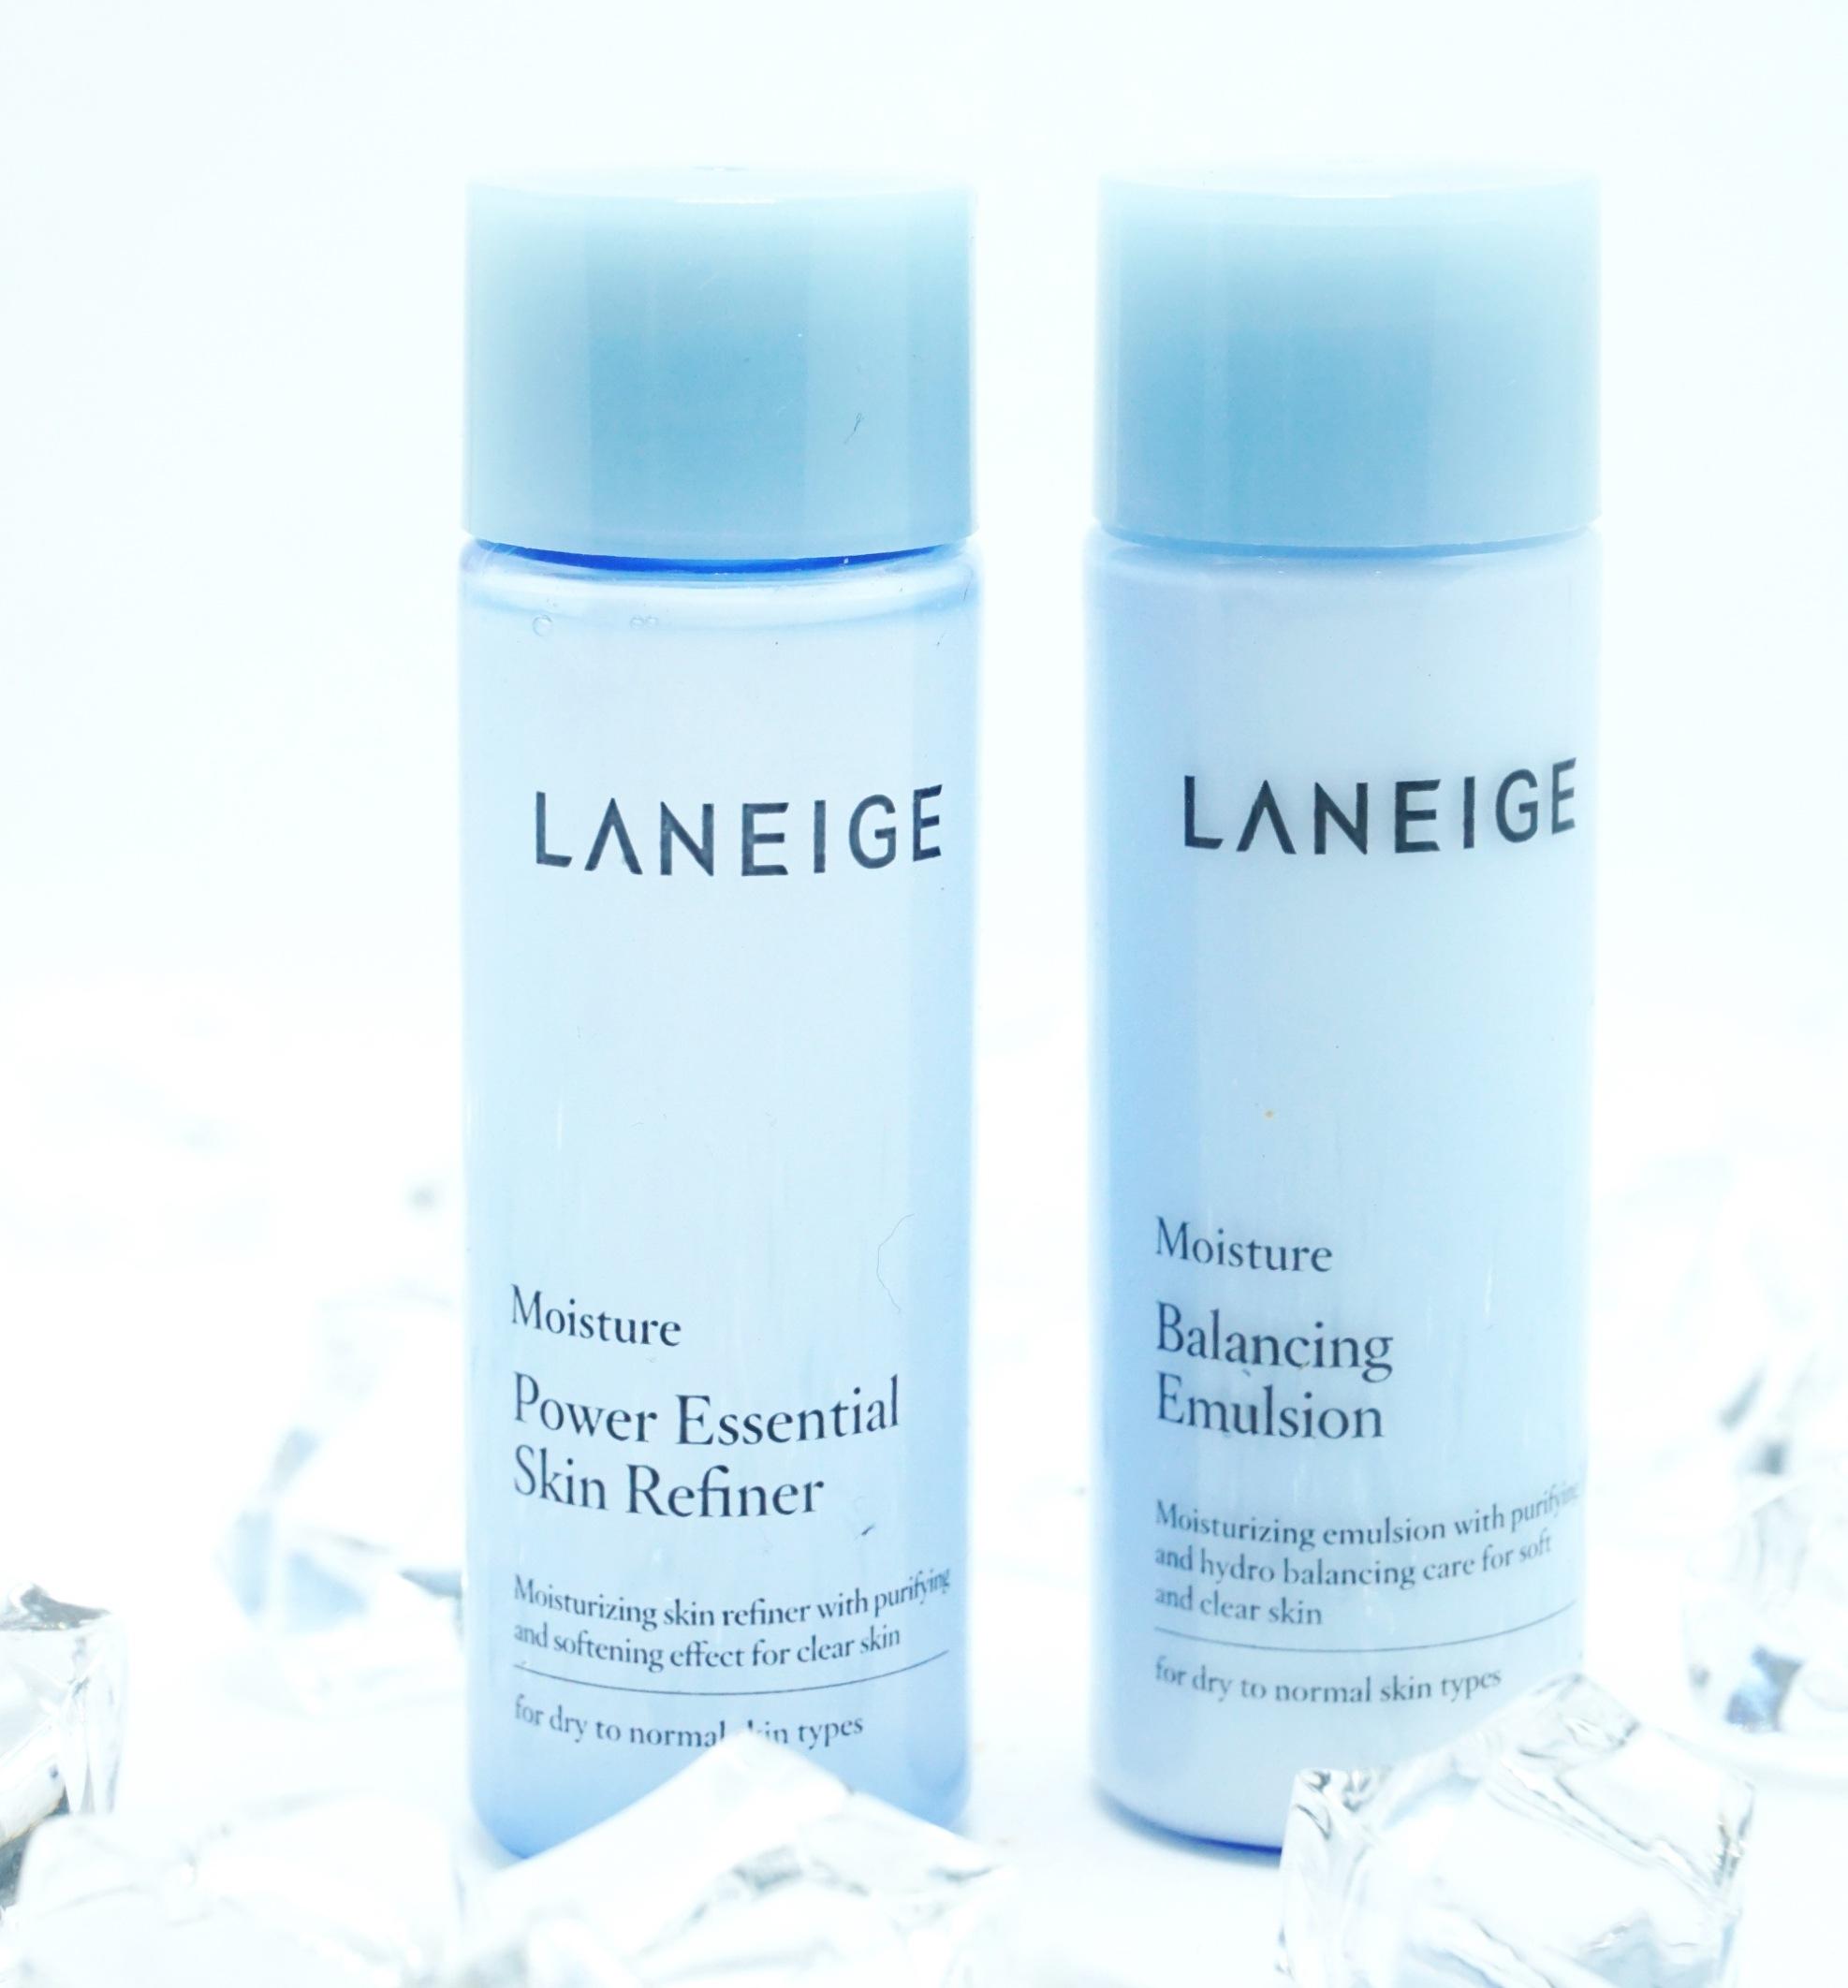 Laneige Power Essential Skin Refiner Moisture+LANEIGE Power Essential Skin Refiner Moistureขนาดทดลอง 25ml. เซทบำรุงสำหรับสาวผิวขาดน้ำต้องการให้ผิวหน้านุ่มชุ่มชื้น #LANEIGE Balancing Emulsion Moisture ขนาด 25ml อิมัลชั่นมอยส์เจอร์ที่มอบความชุ่มชื่นล้ำลึกให